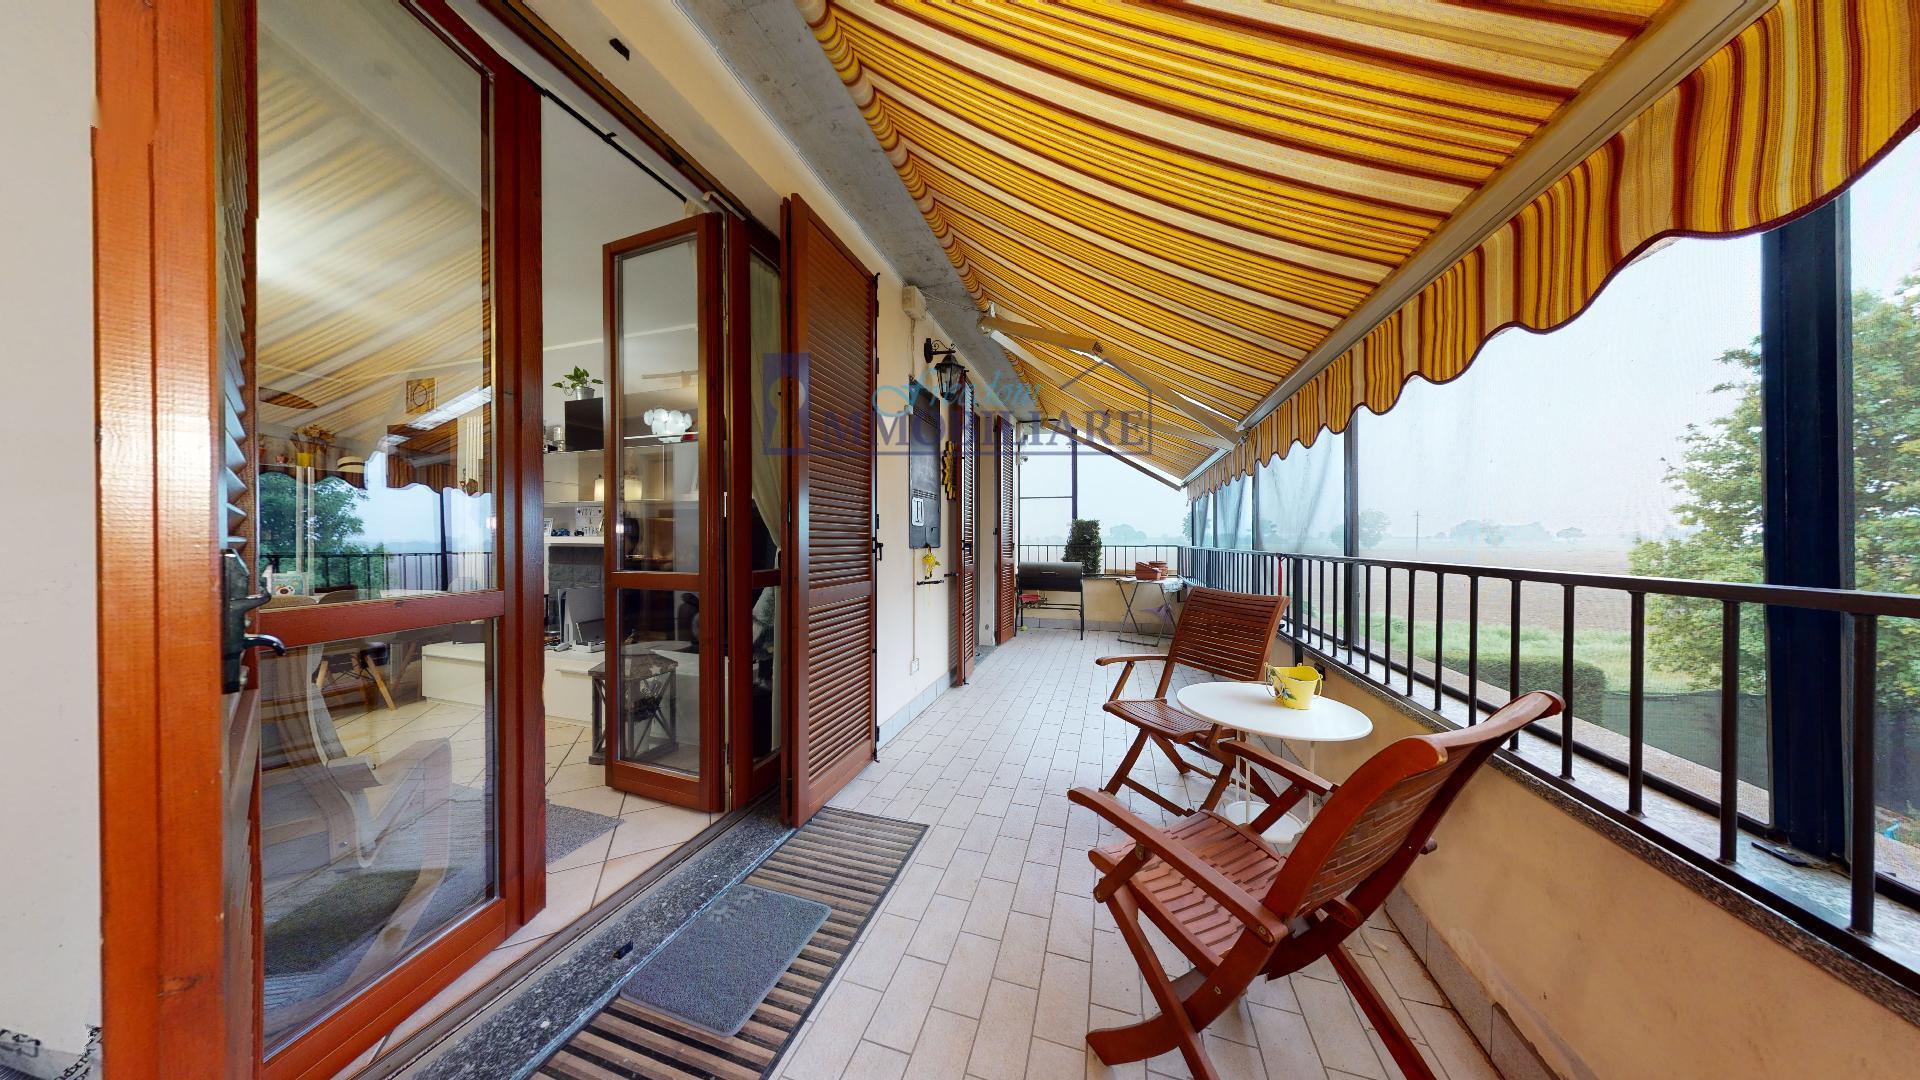 Bilocale via Girettina 12, Bascapè